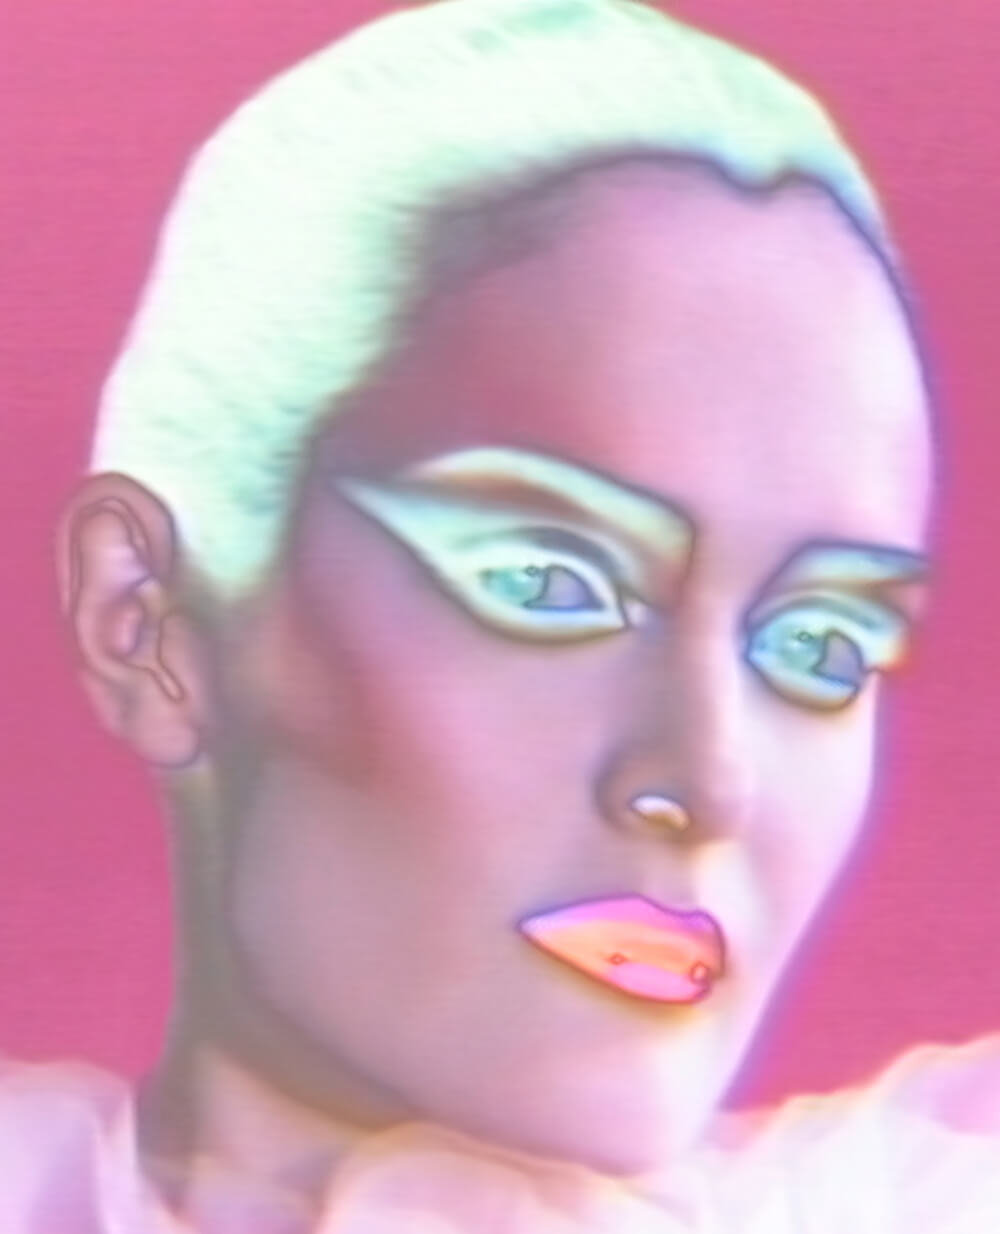 fd56a3ab259 Hannah Motler wears PAT McGRATH LABS – Mothership I Eyeshadow Palette  Subliminal, PermaGel Ultra Glide Eye Pencil, Perma Precision Liquid Eyeliner,  ...